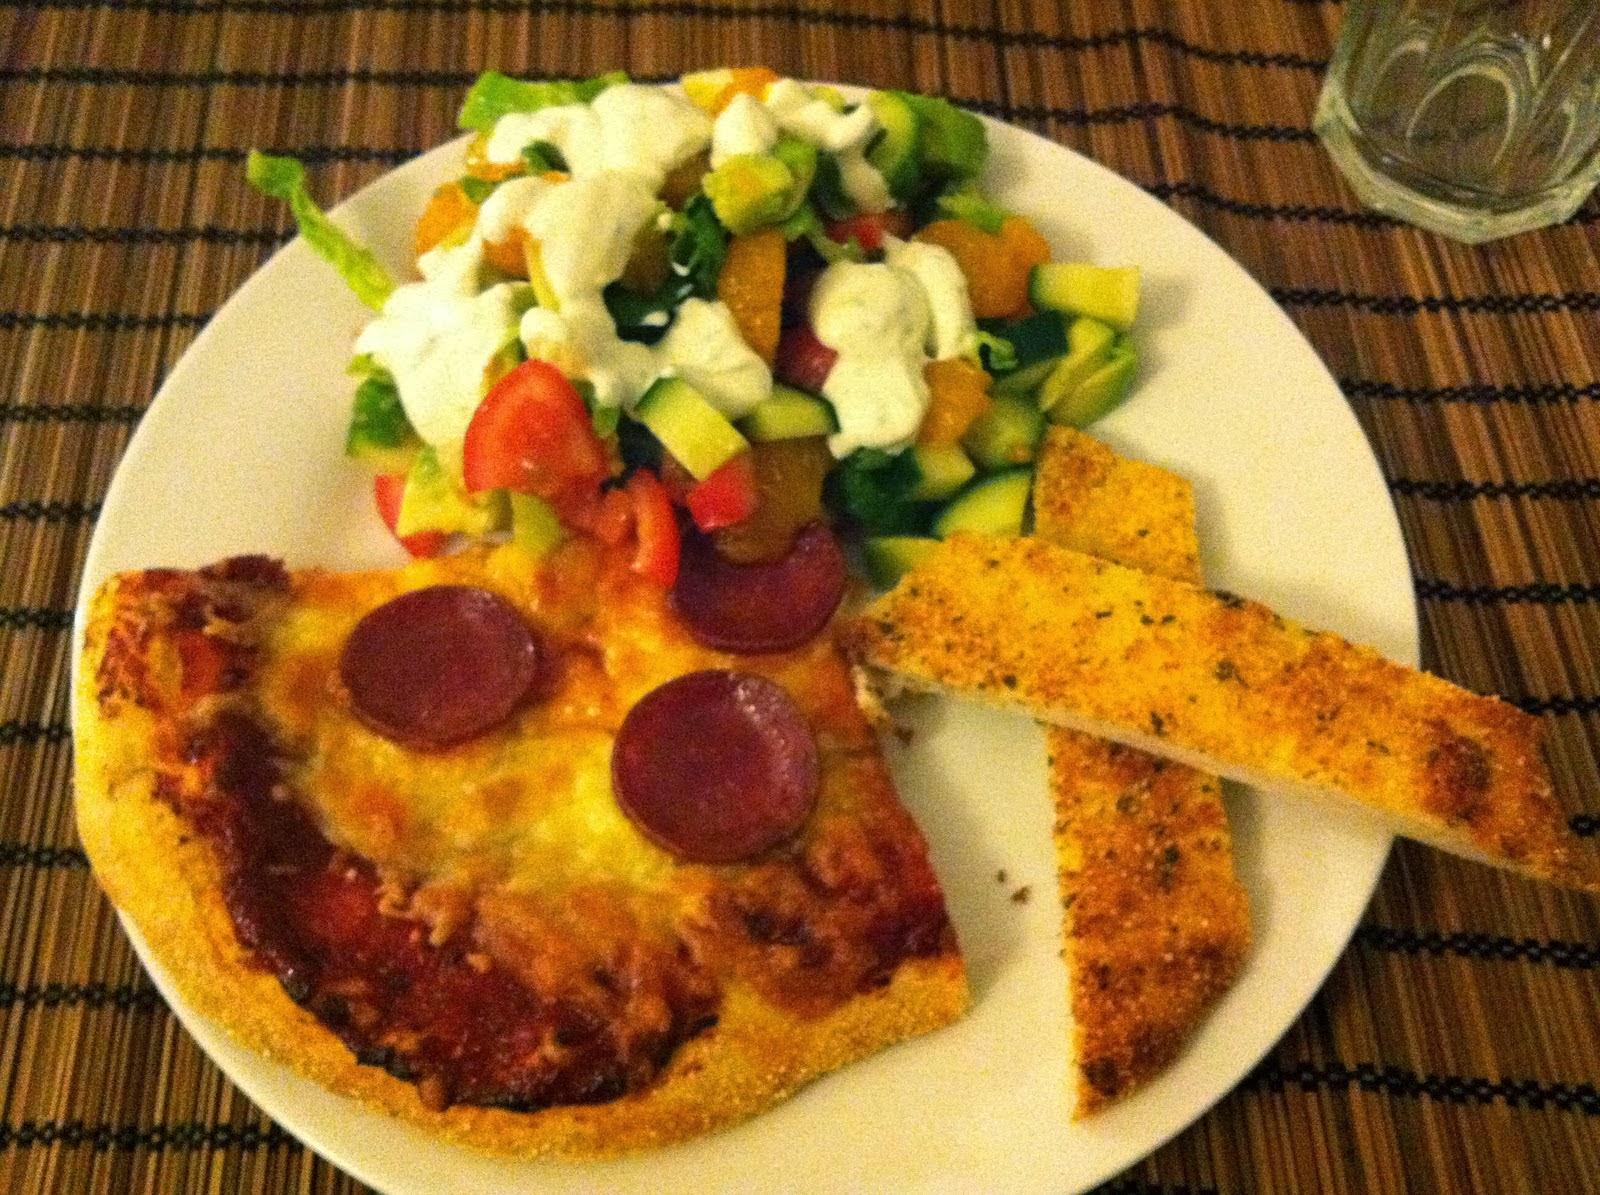 Domino's pizza klon